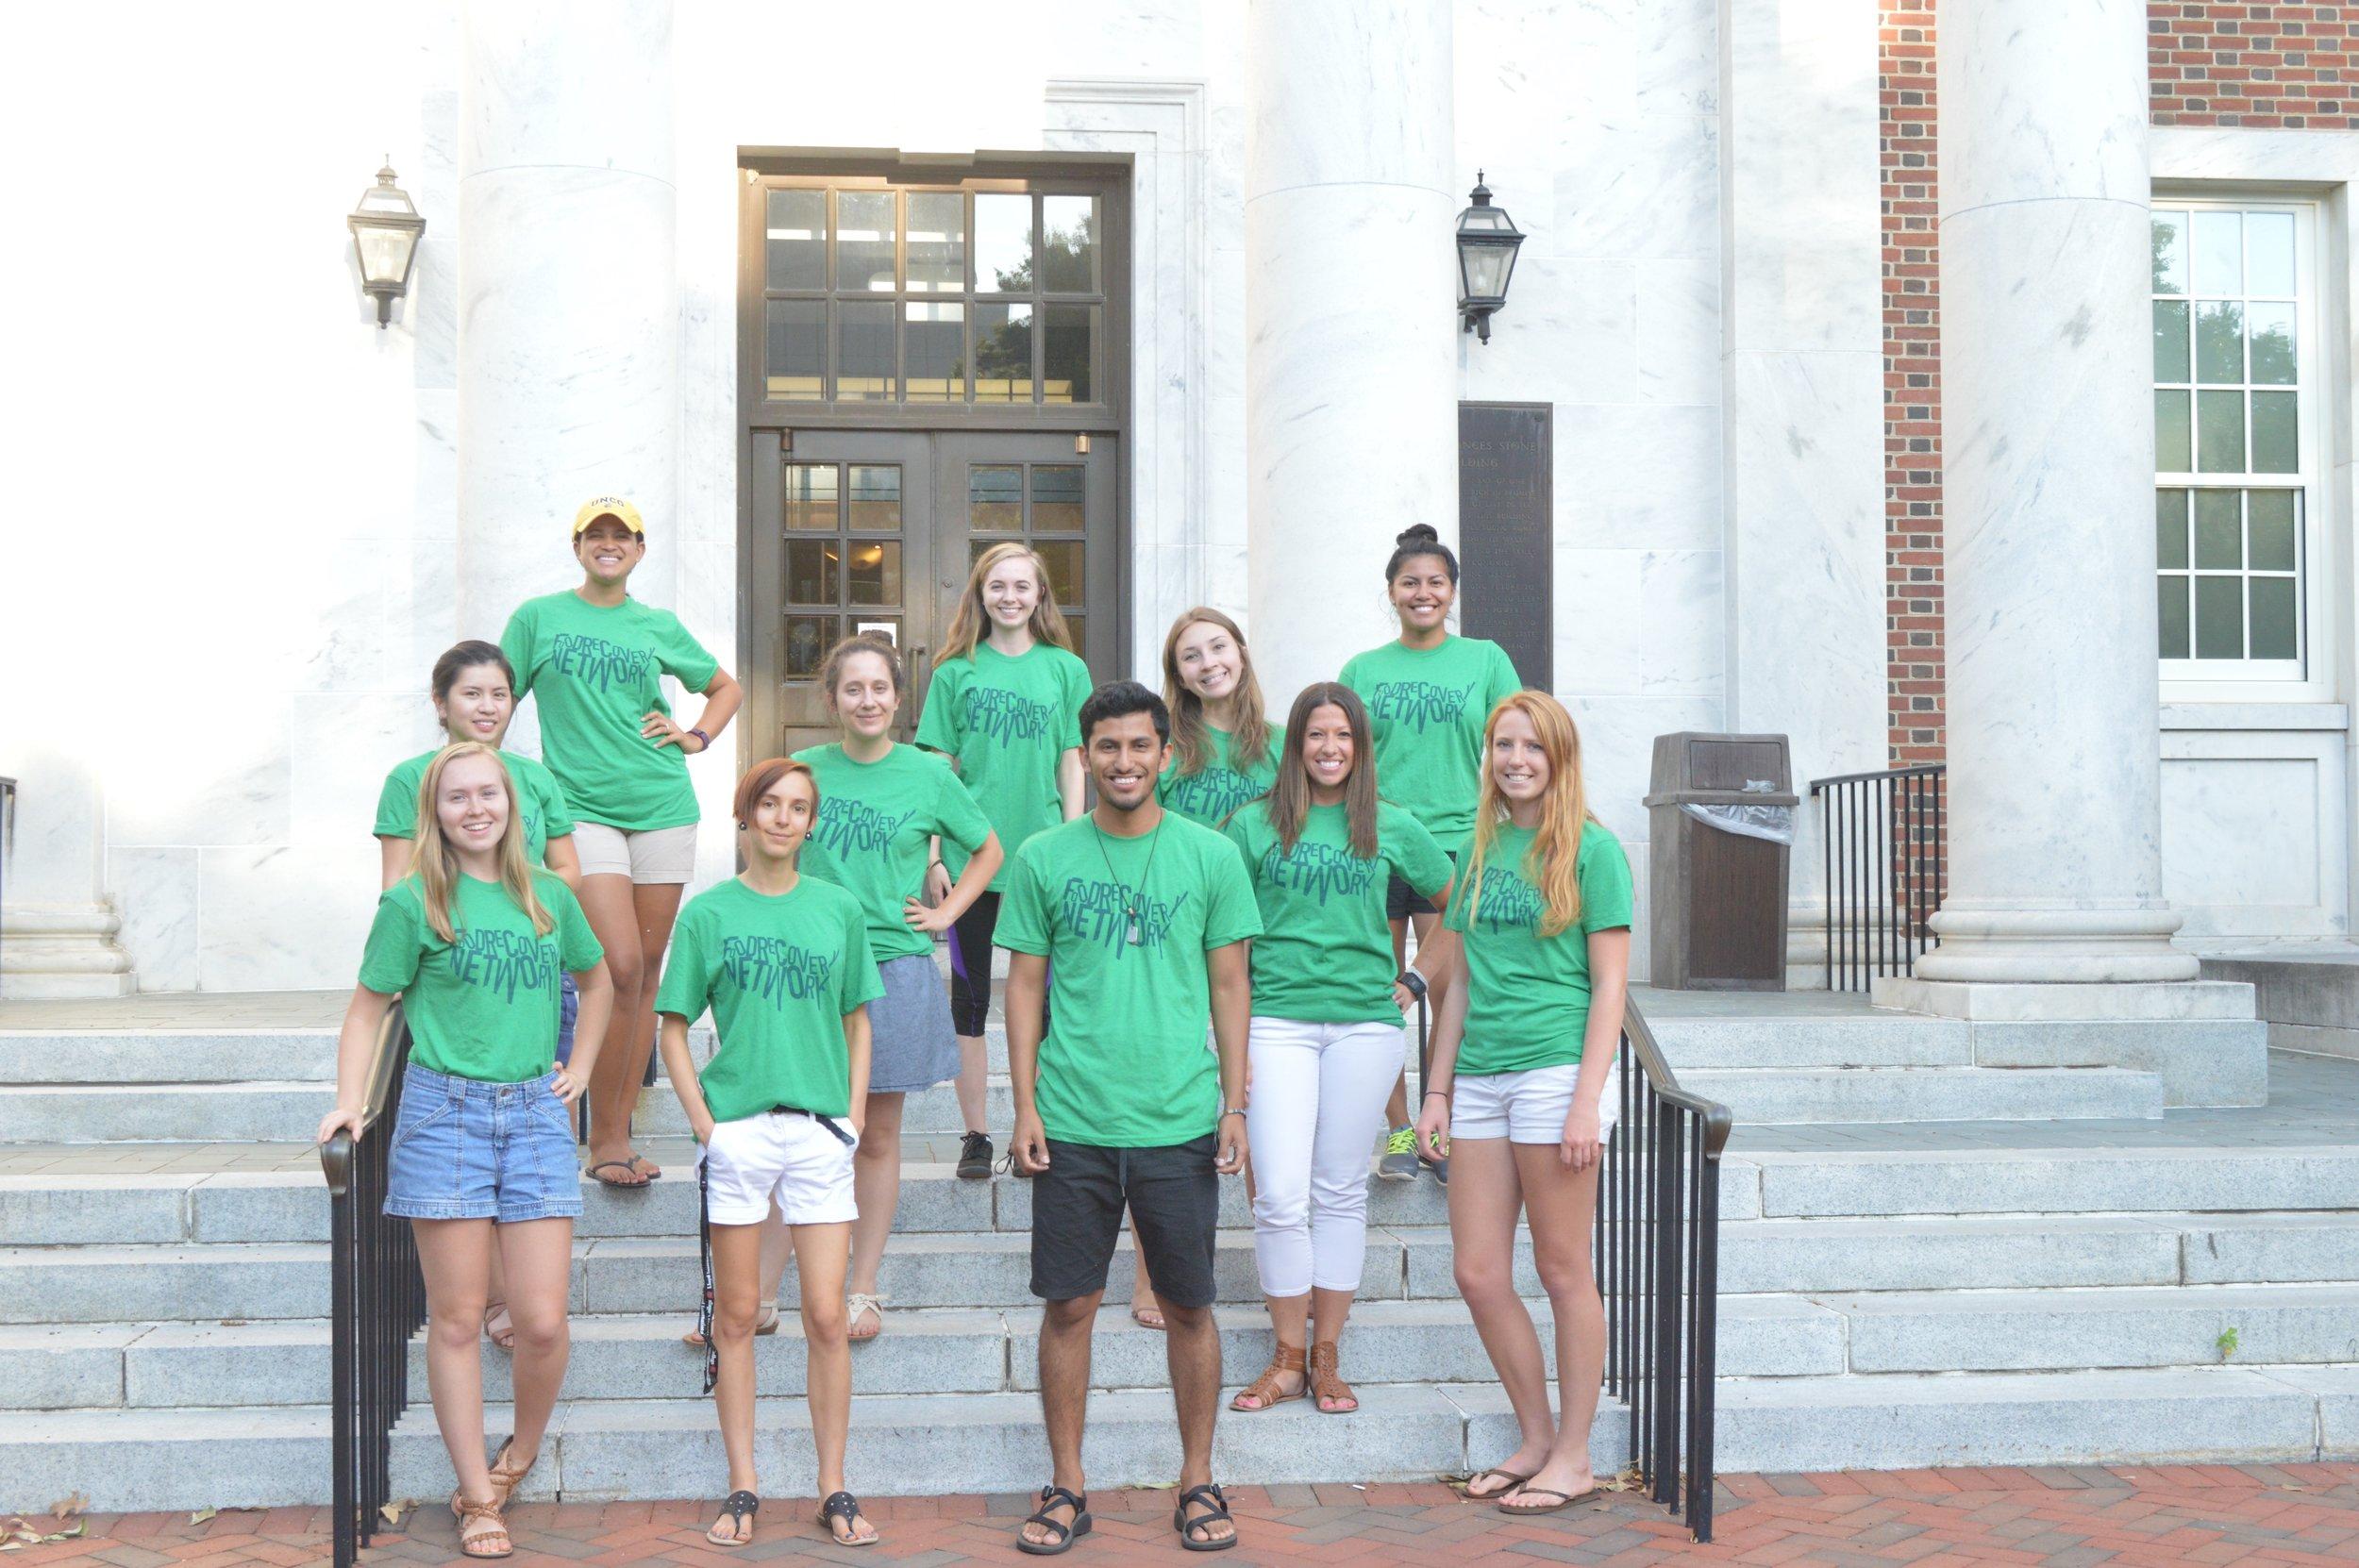 University of North Carolina Greensboro 2016 Leadership Team Photo bestpic.jpg